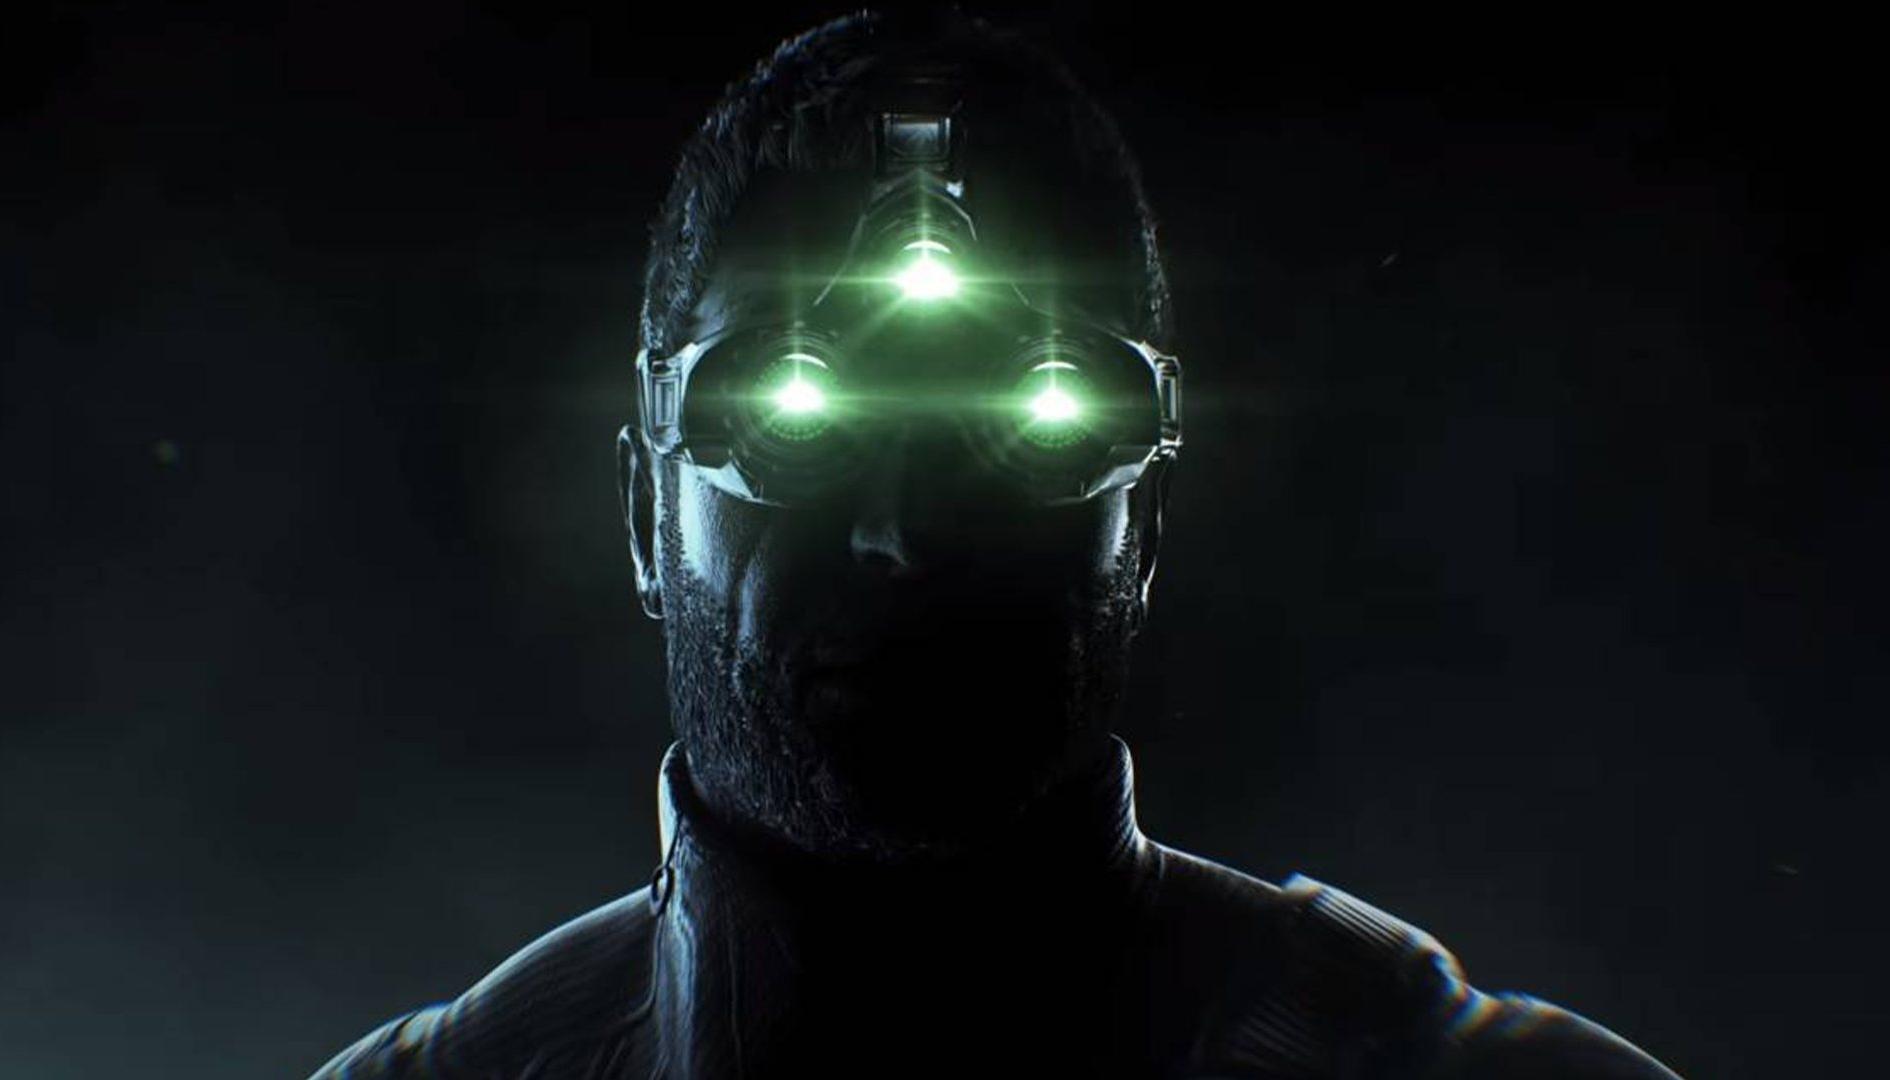 Splinter Cell verrà annunciato all'E3 2020?